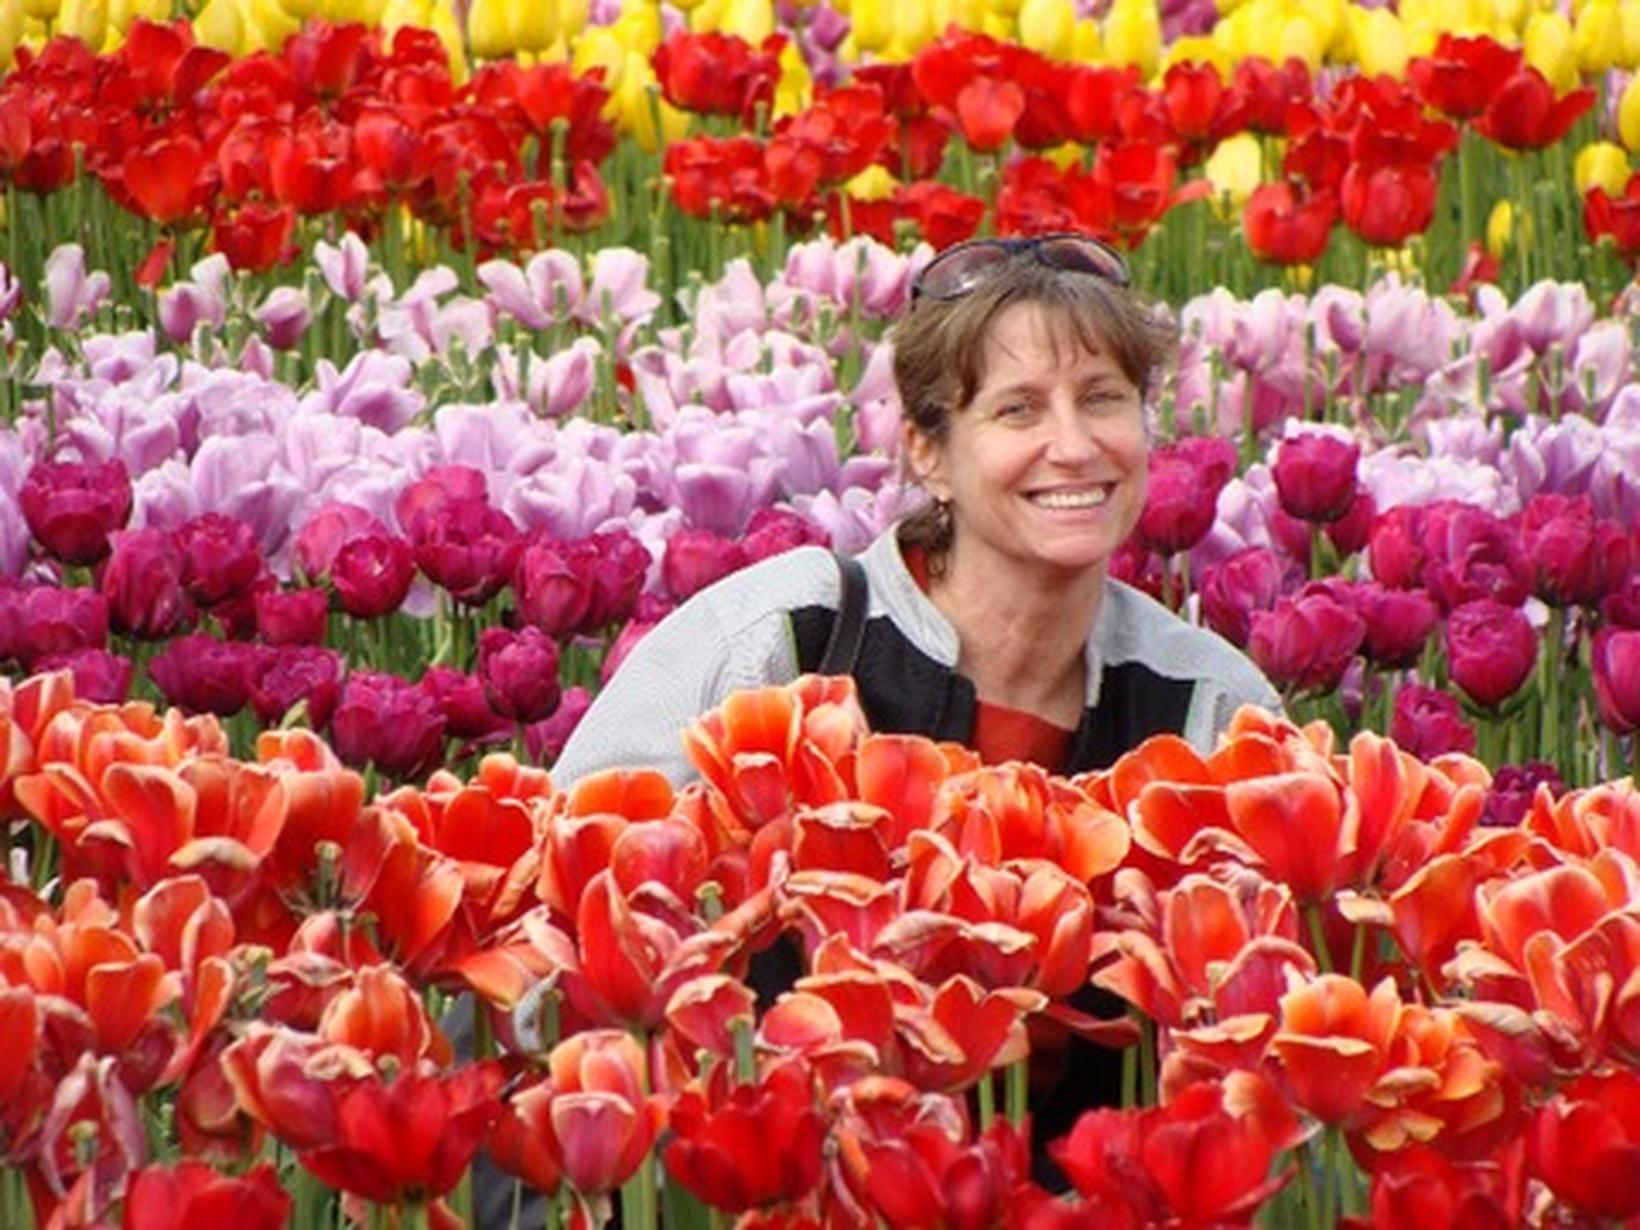 Lisa from Portland, Oregon, United States